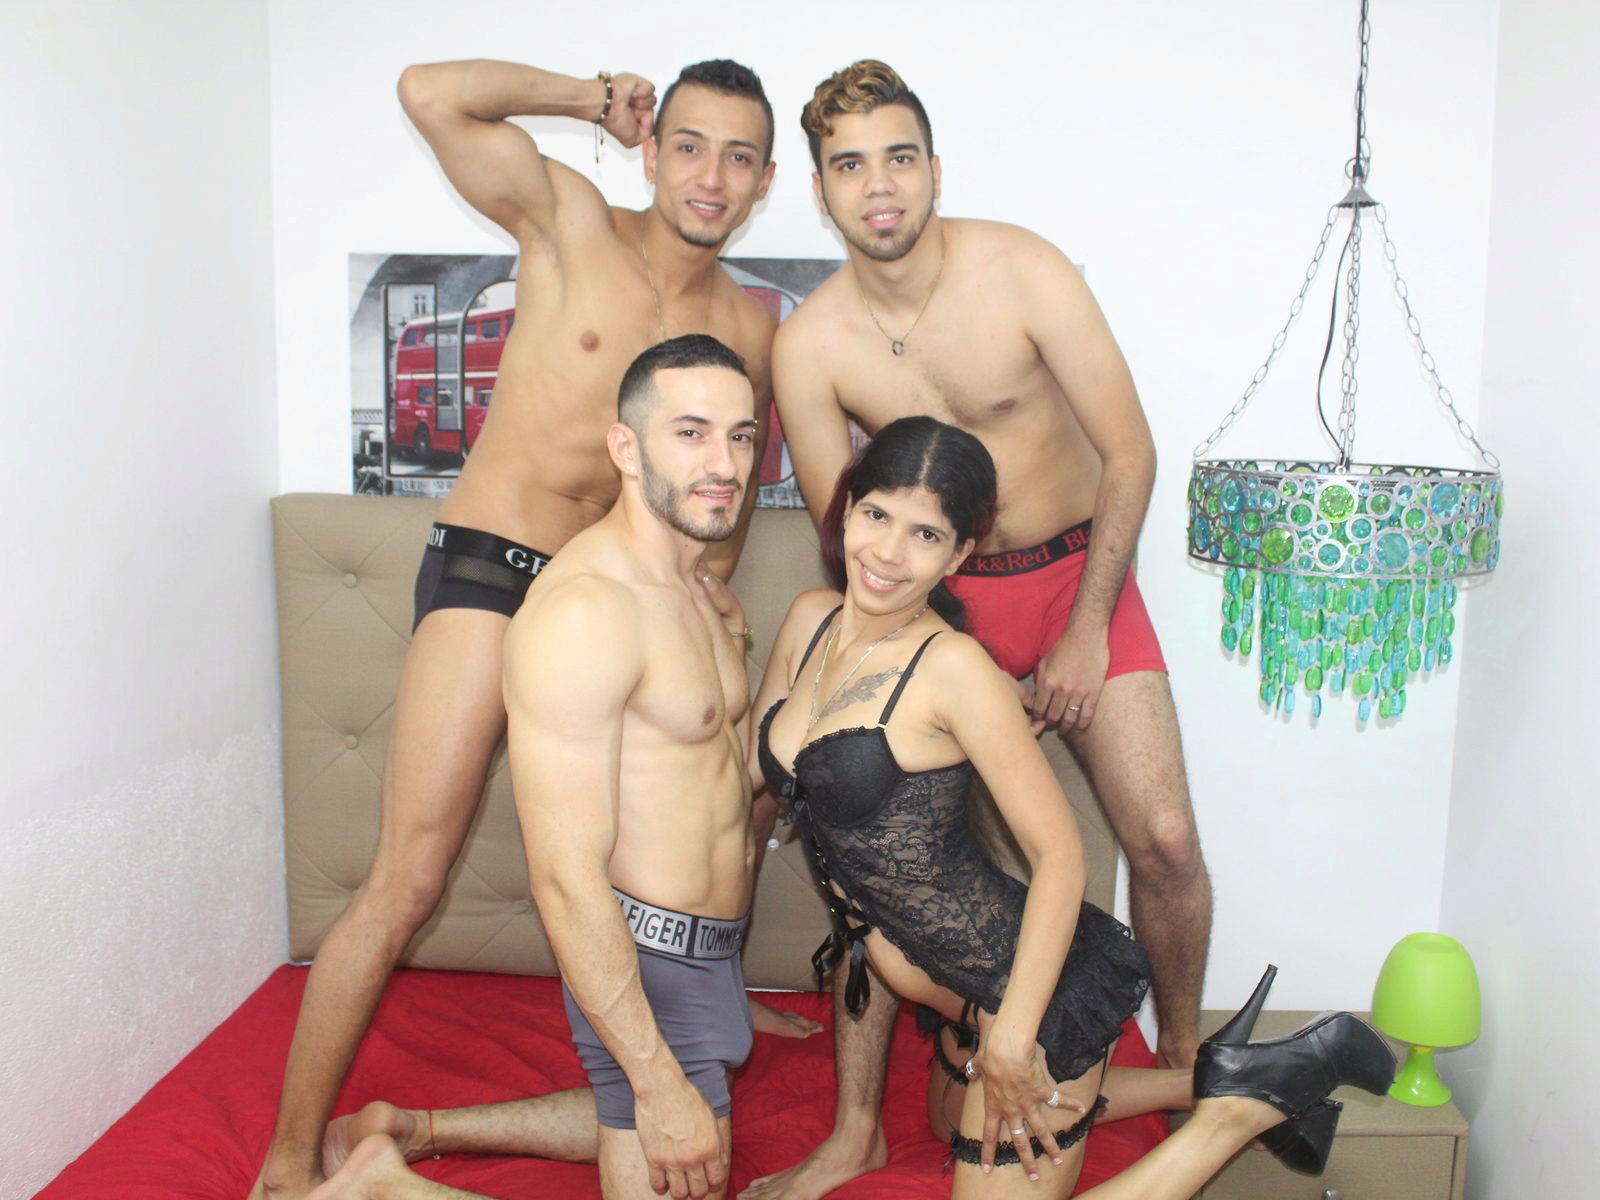 Marce P & Zevan Red & Gavbo M & Kiyle